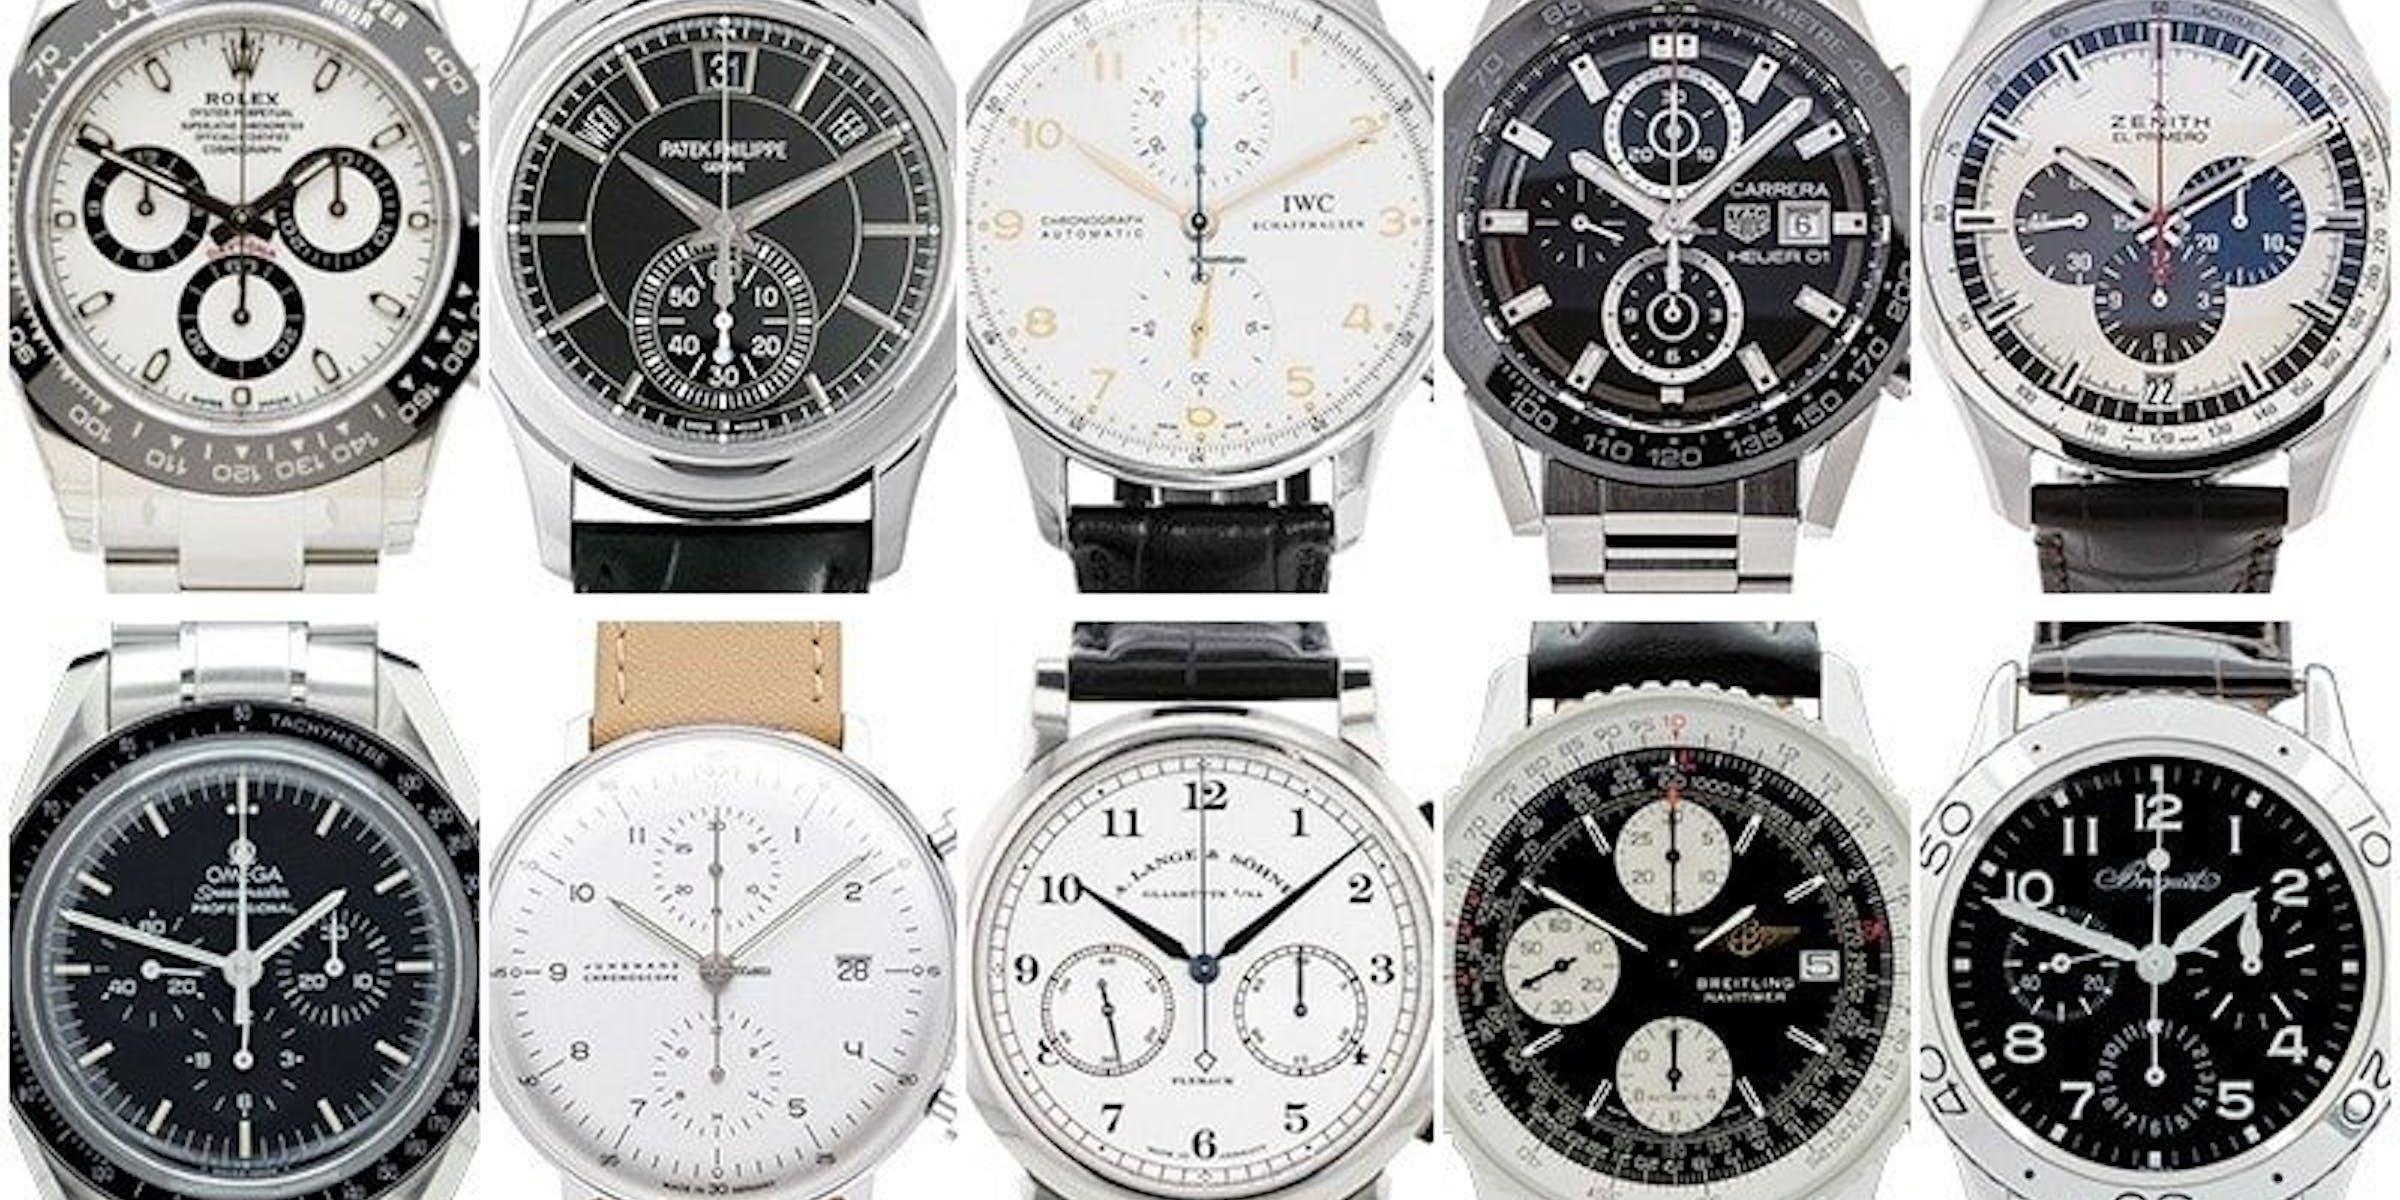 Top 10 Chronographs